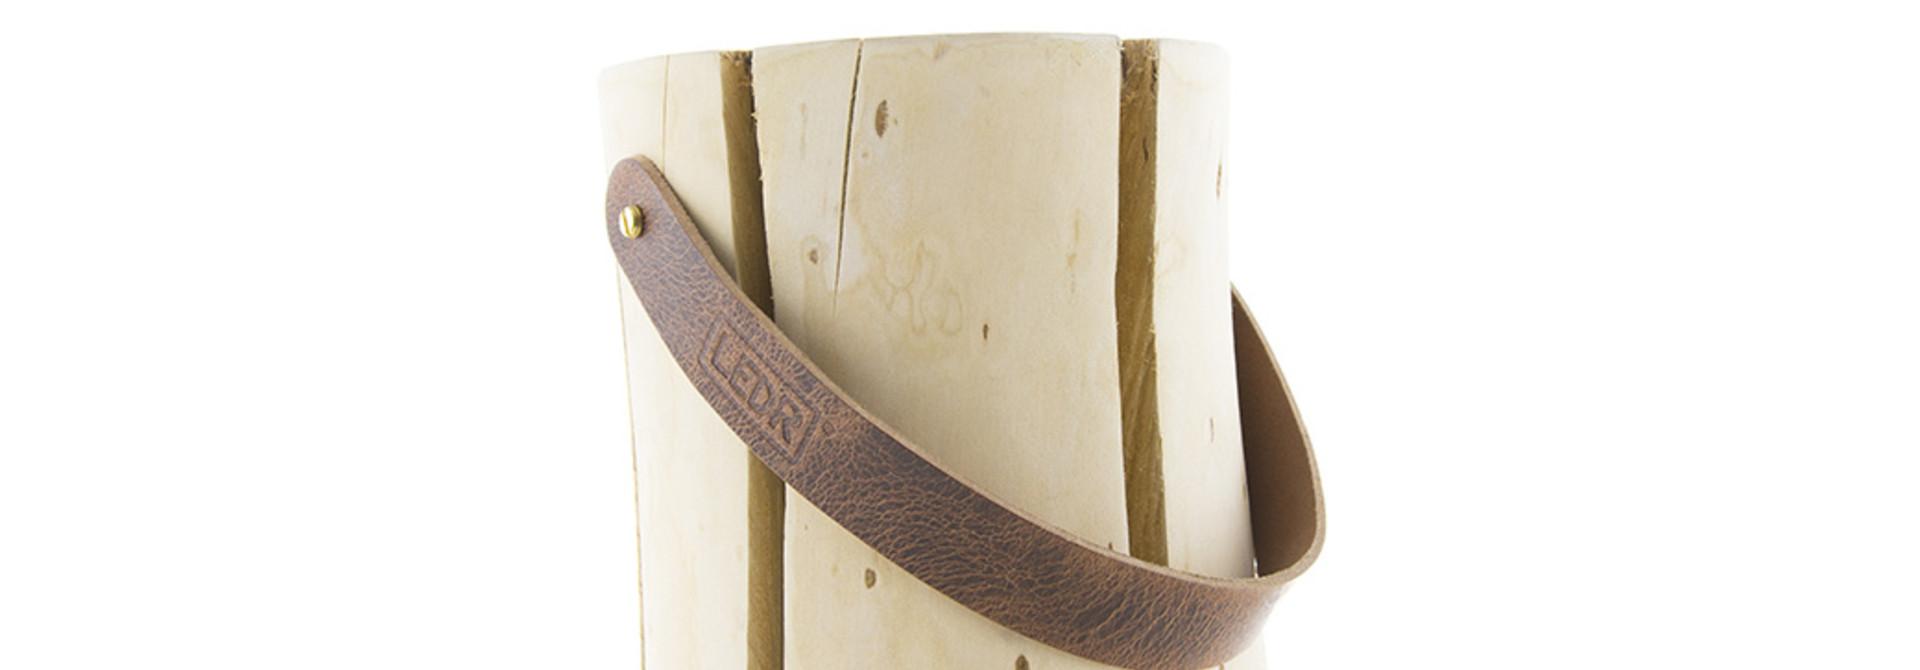 Wood Light - Cherry Wood M || Leather edition